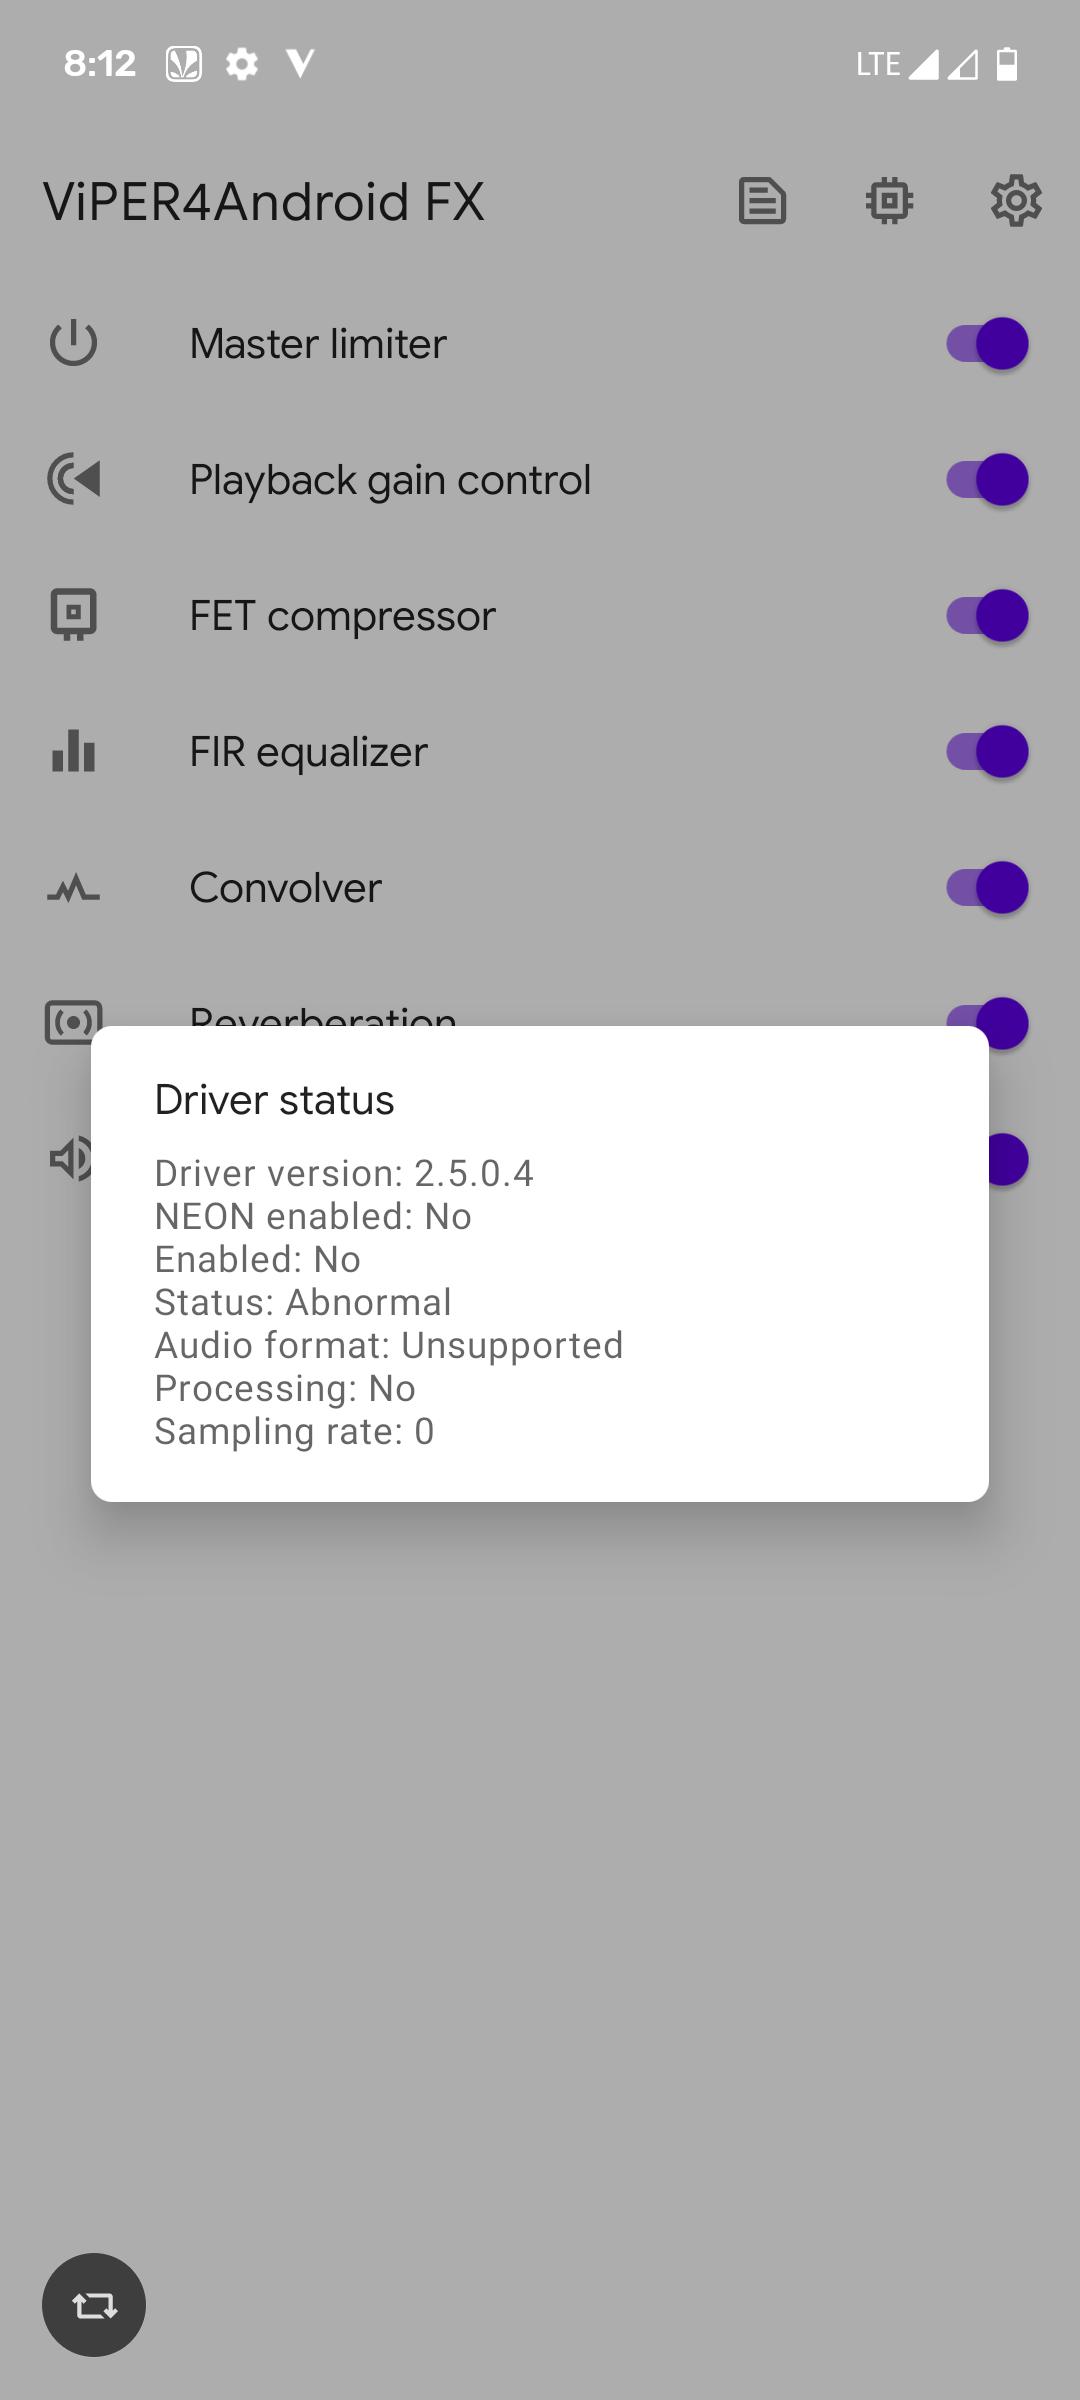 Screenshot_20210123-081259_ViPER4Android_FX.png